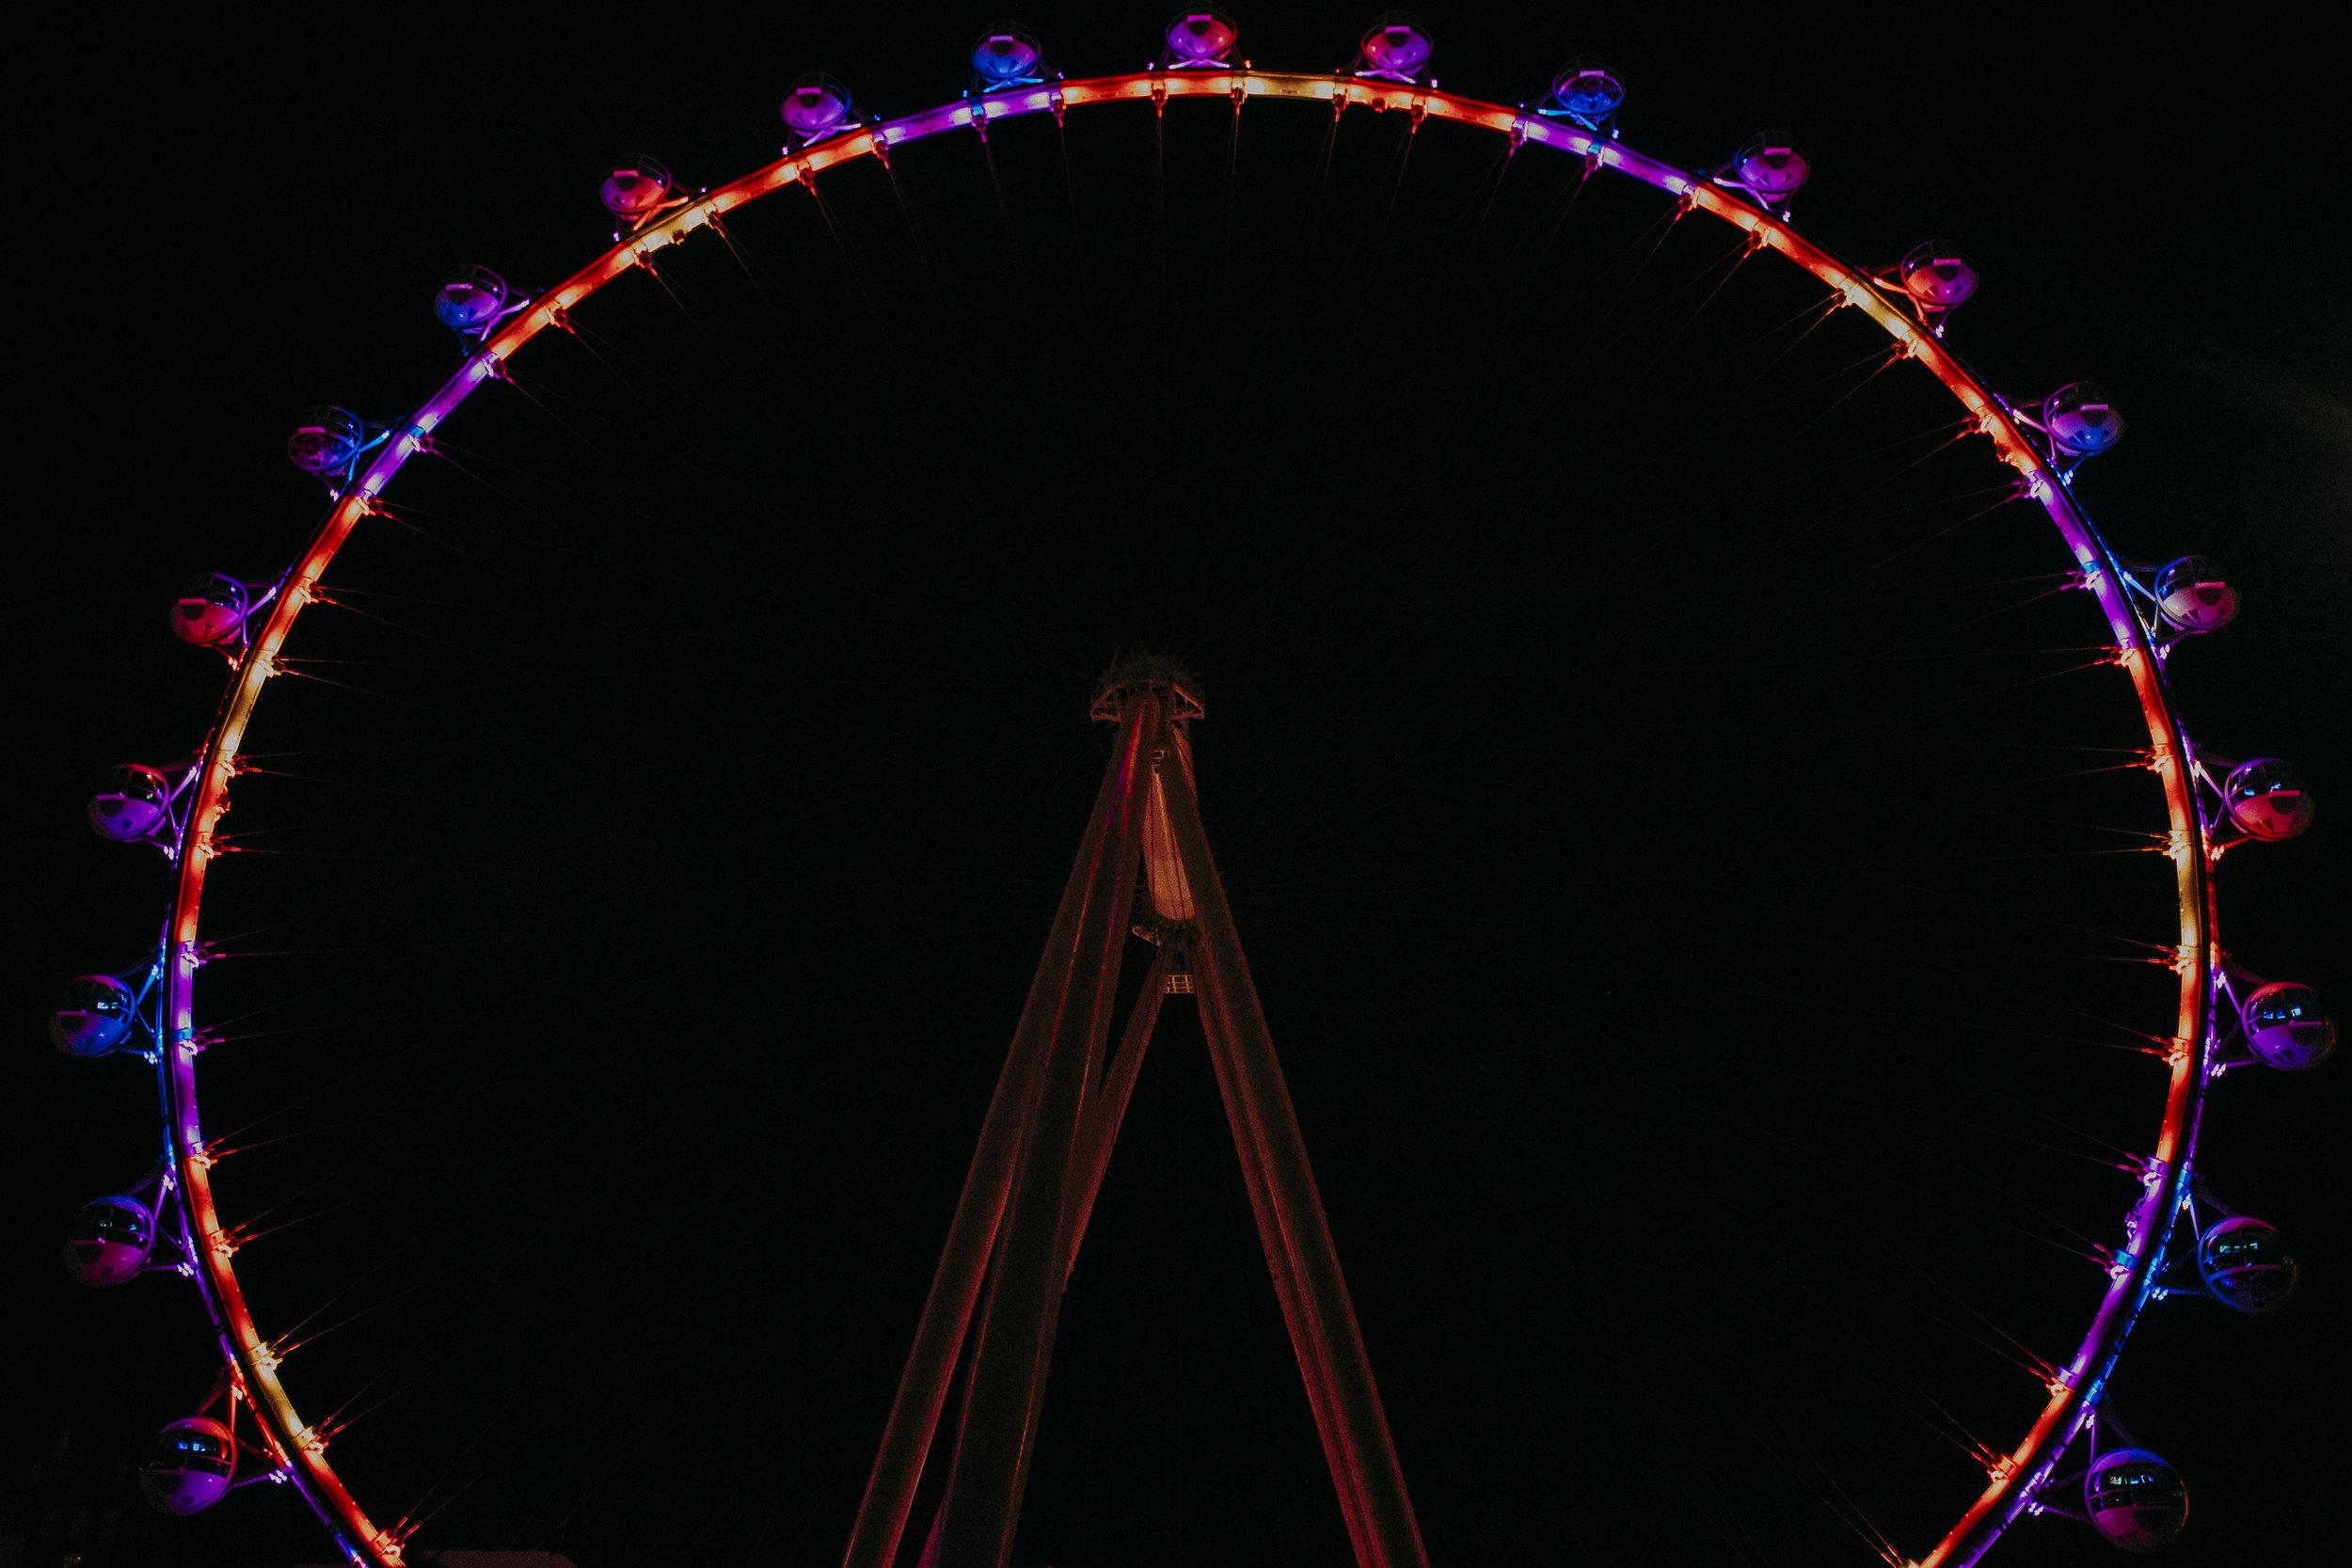 What-To-Do-In-Las-Vegas-15.jpg